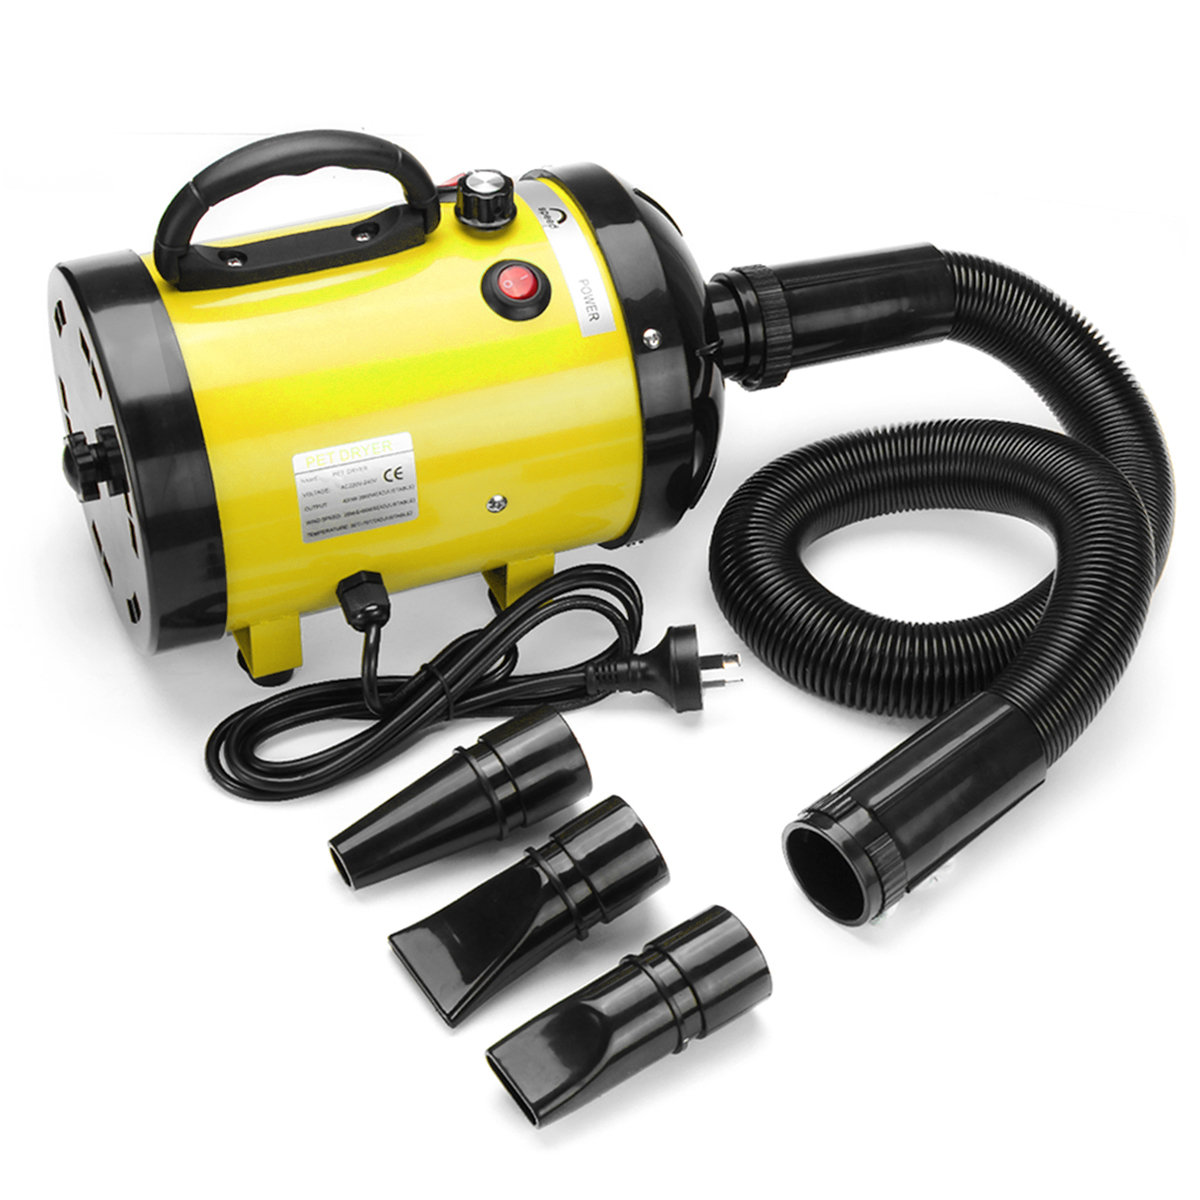 2800W Pet Fur Dryer Grooming Blower Dog Cat Hairdryer Blaster Heater Low Noise AU Plug